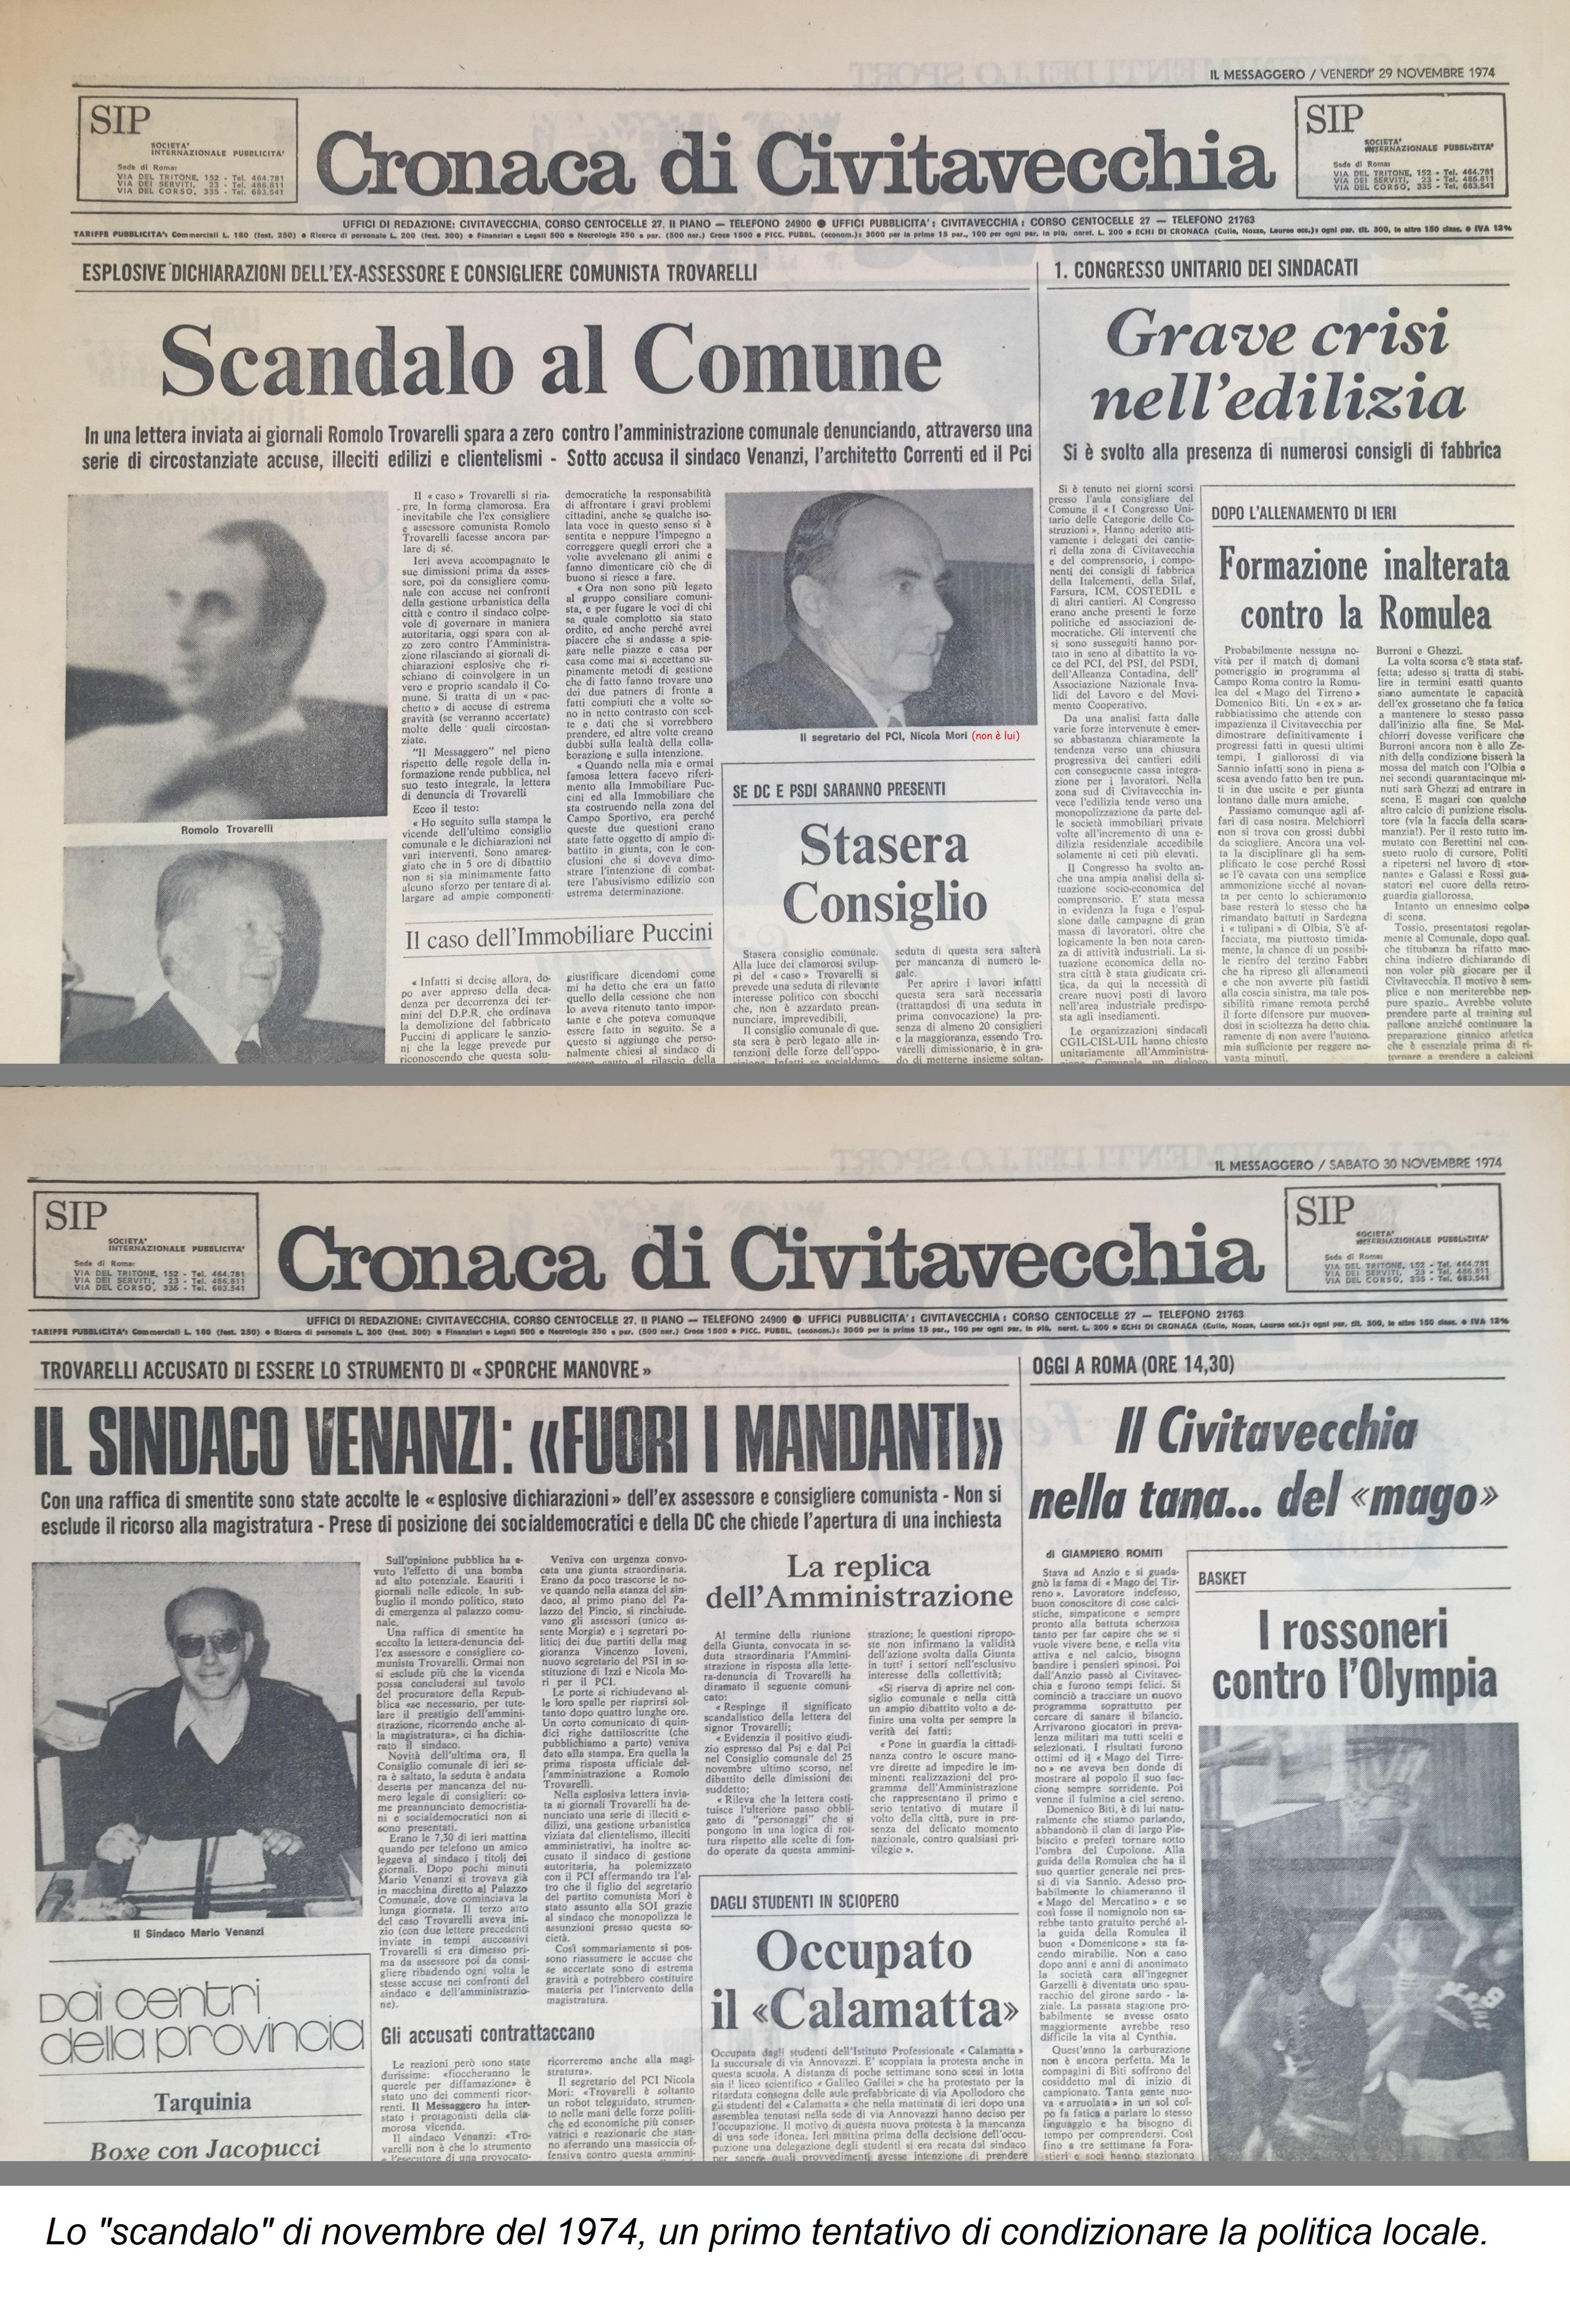 1974.11.29. Scandalo in Comune